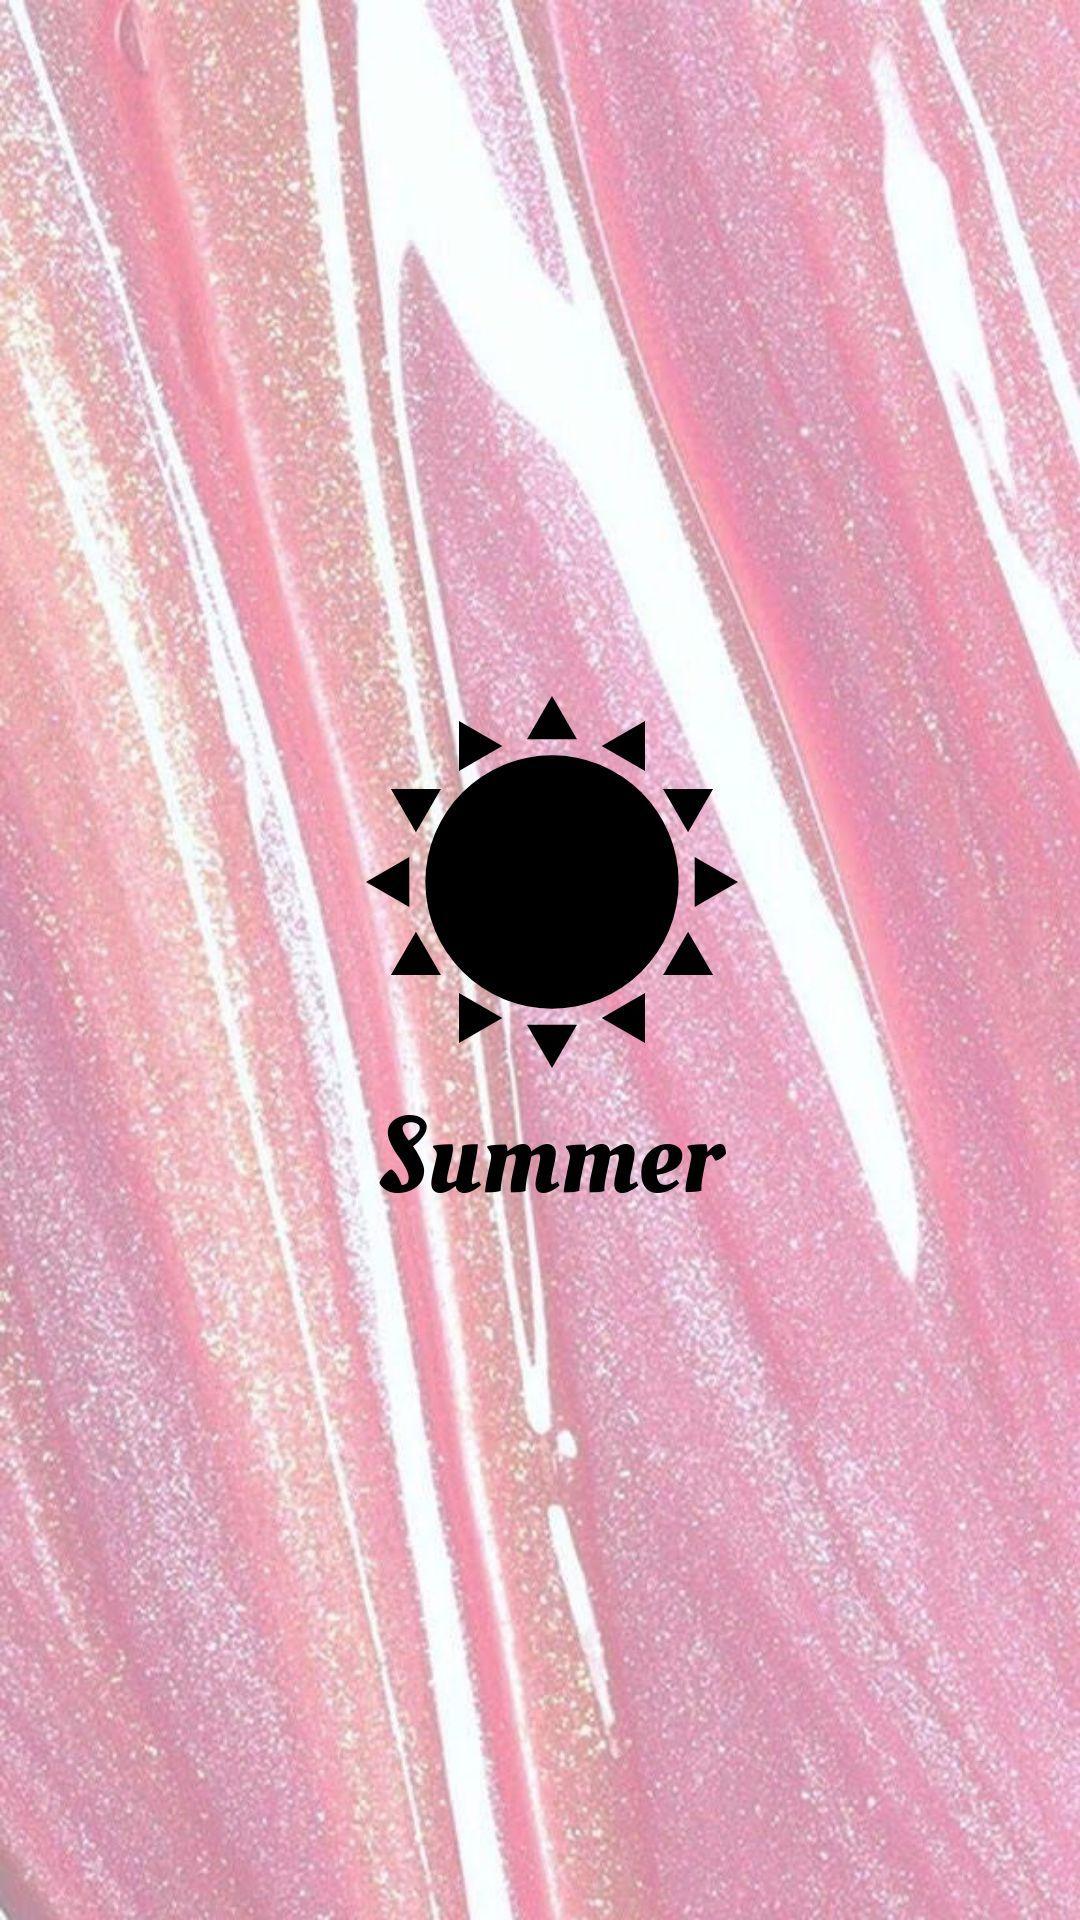 Instagram Wallpaper Background Pink Pinky Hi Em 2020 Ideias Instagram Instagram Dicas Icones Do Instagram